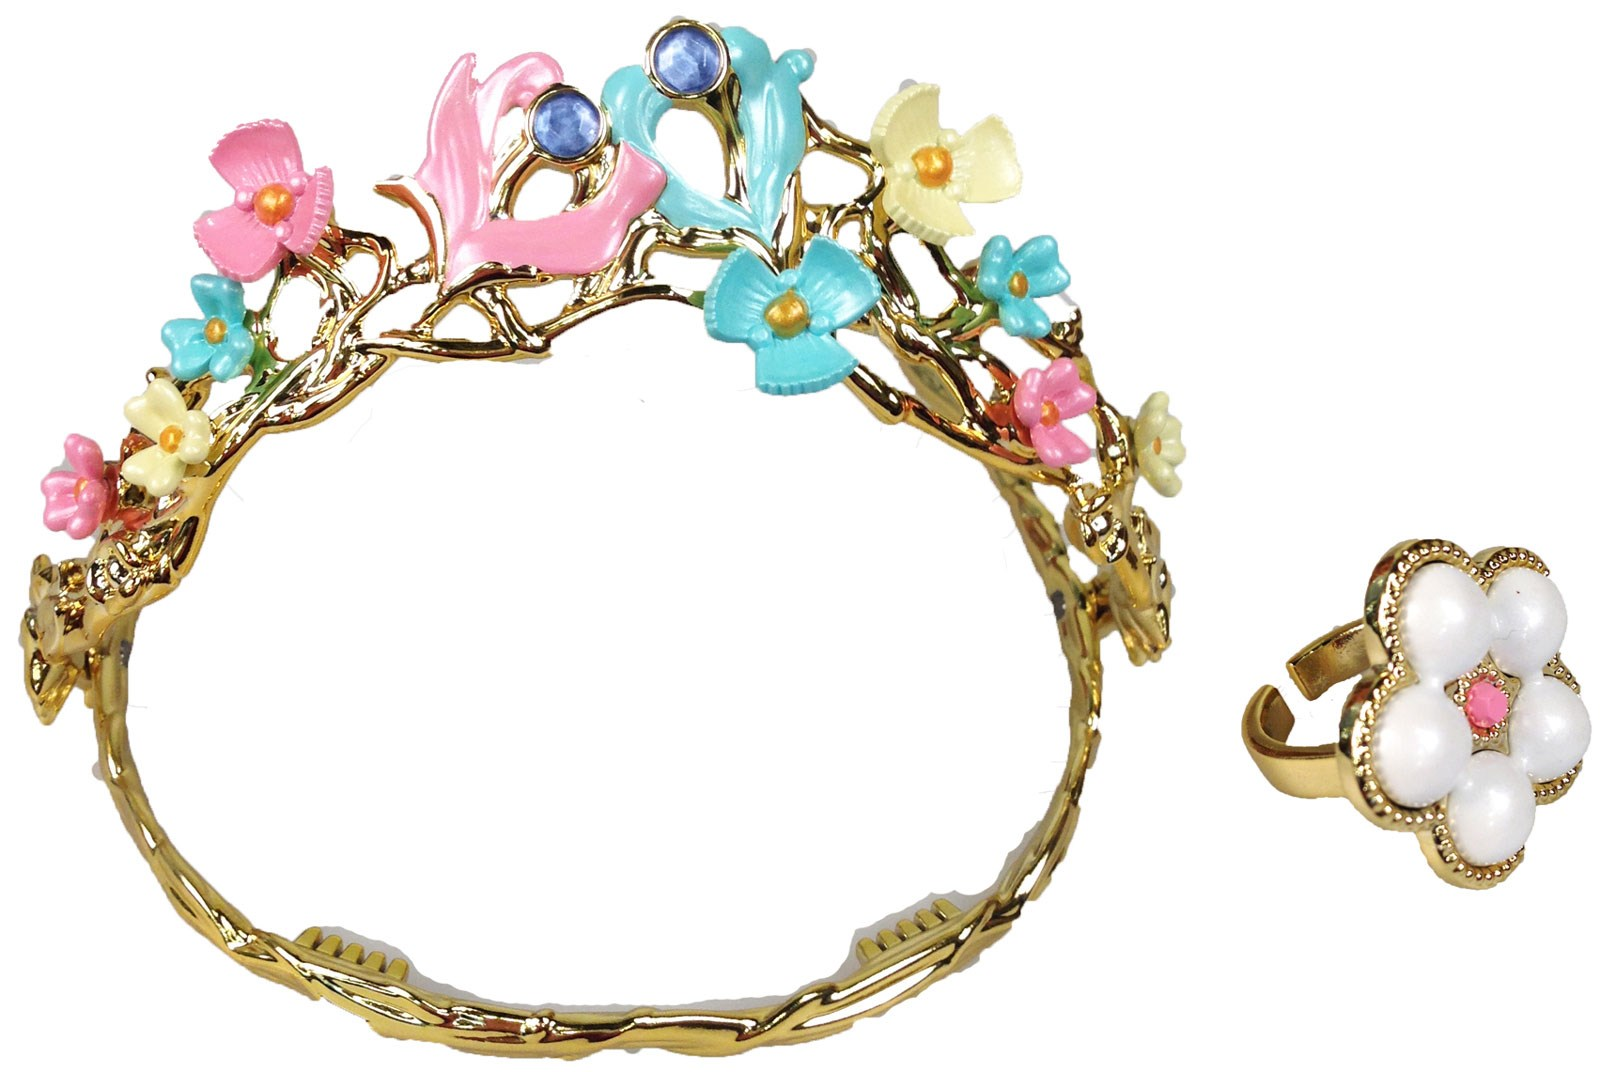 ring alt image 1 cinderella movie wedding celebration tiara - Cinderella Wedding Ring